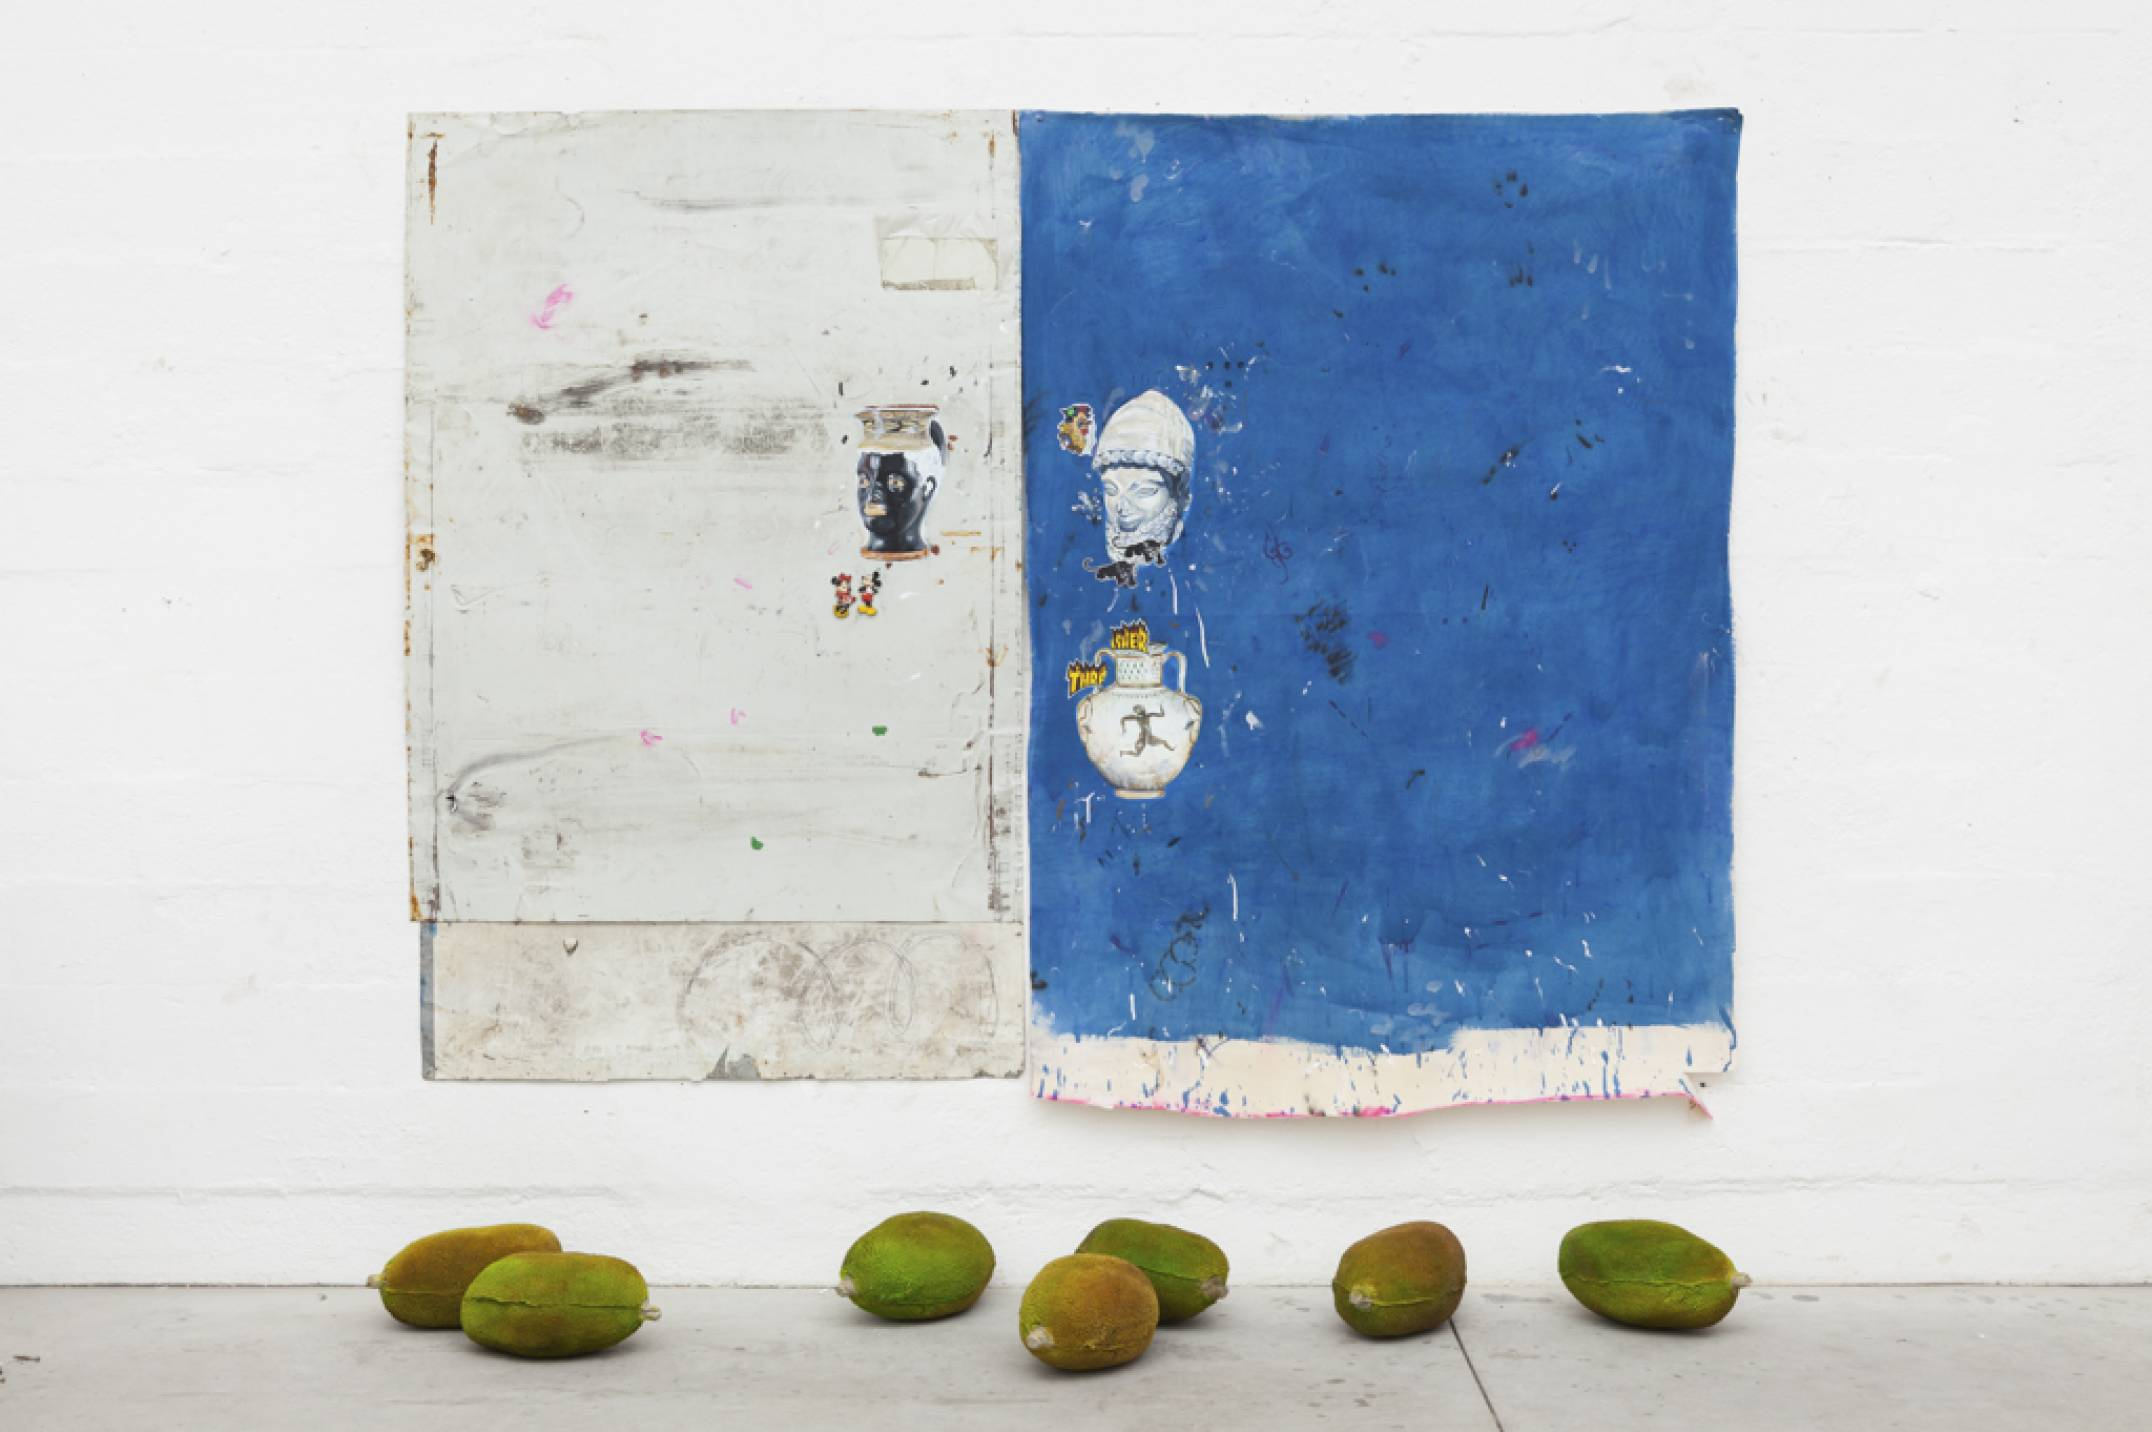 Paulo Nimer Pjota, <em>Blue Indigo</em>, 2017,acrylic, pencil, pigment, magnet, pen on canvas, aluminum sheet and resin, 260 × 200 (painting) cm 37 × 21 cm (objects) - Mendes Wood DM